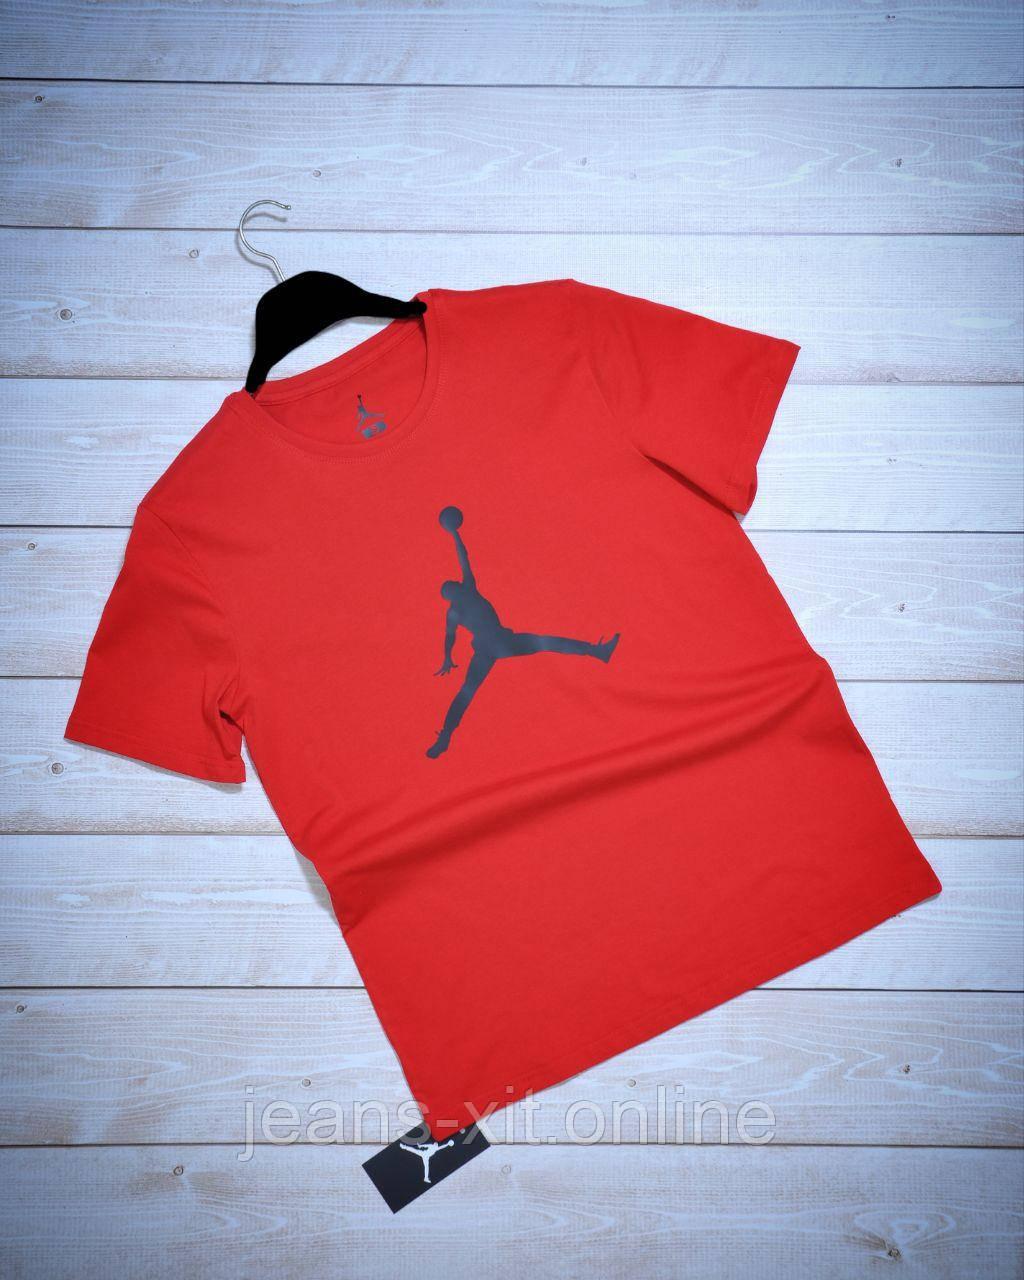 Футболка мужская 2XL(р) черная 1008-21 Jordan Турция Лето-D 2XL, красная